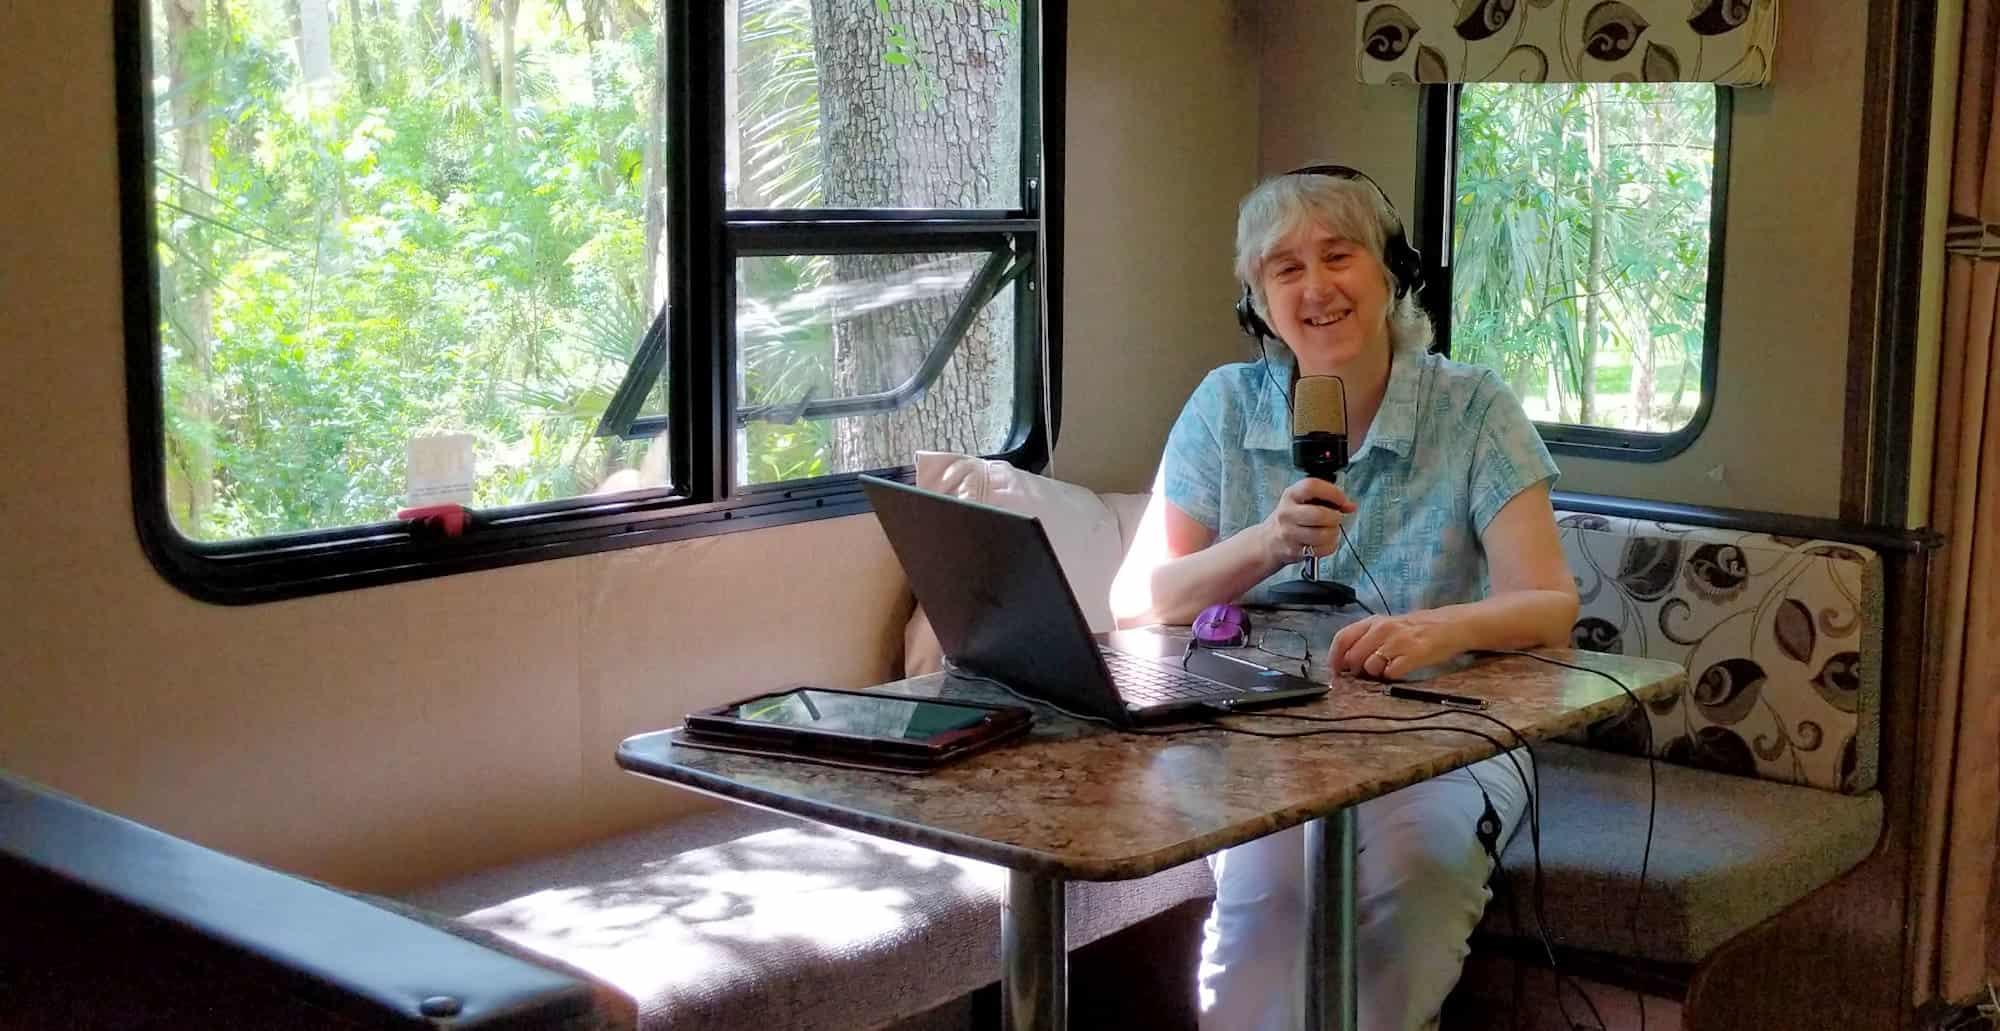 Terry Modica podcast host